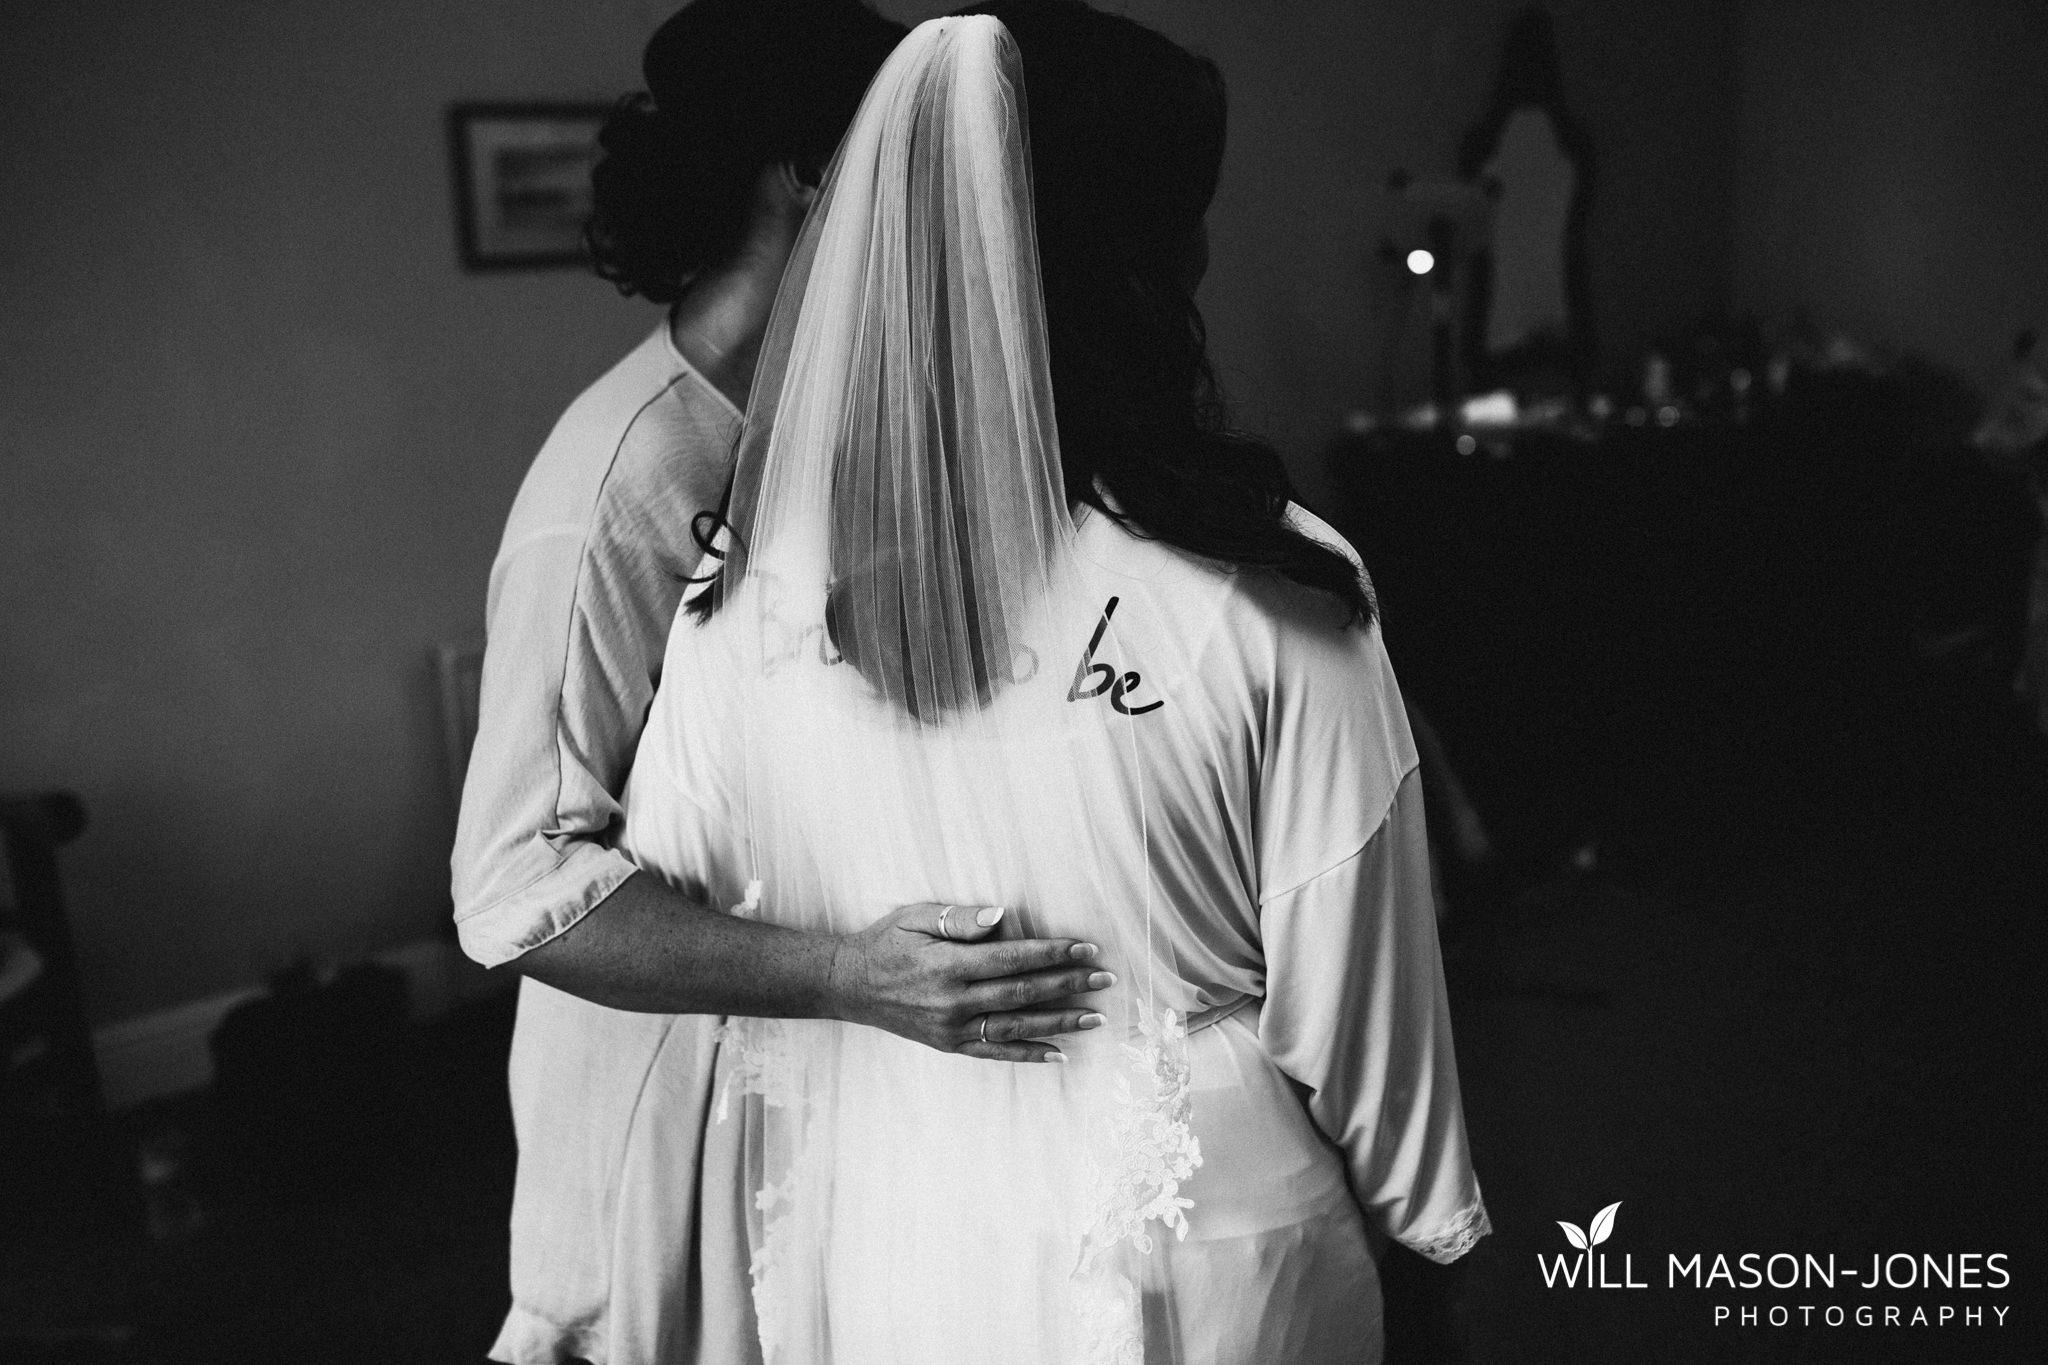 plas-glansevin-wet-rainy-bridal-wedding-preparations-swansea-photographers-8.jpg